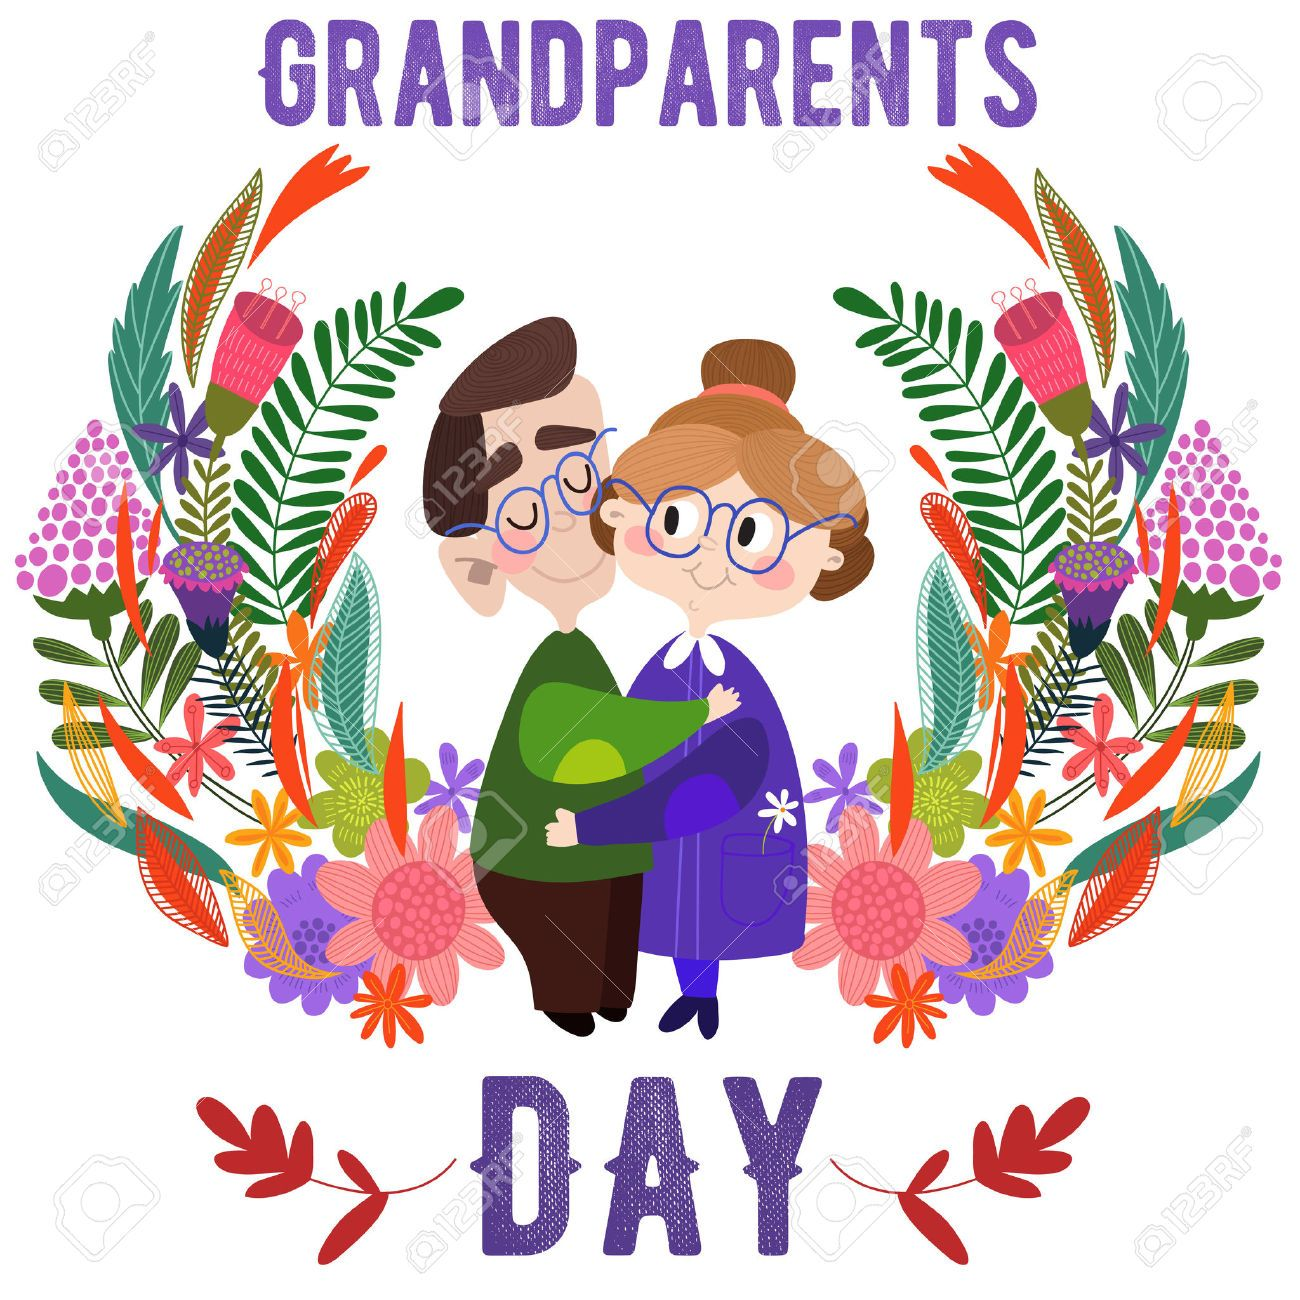 Pin By Pam Smith On Grandchildren